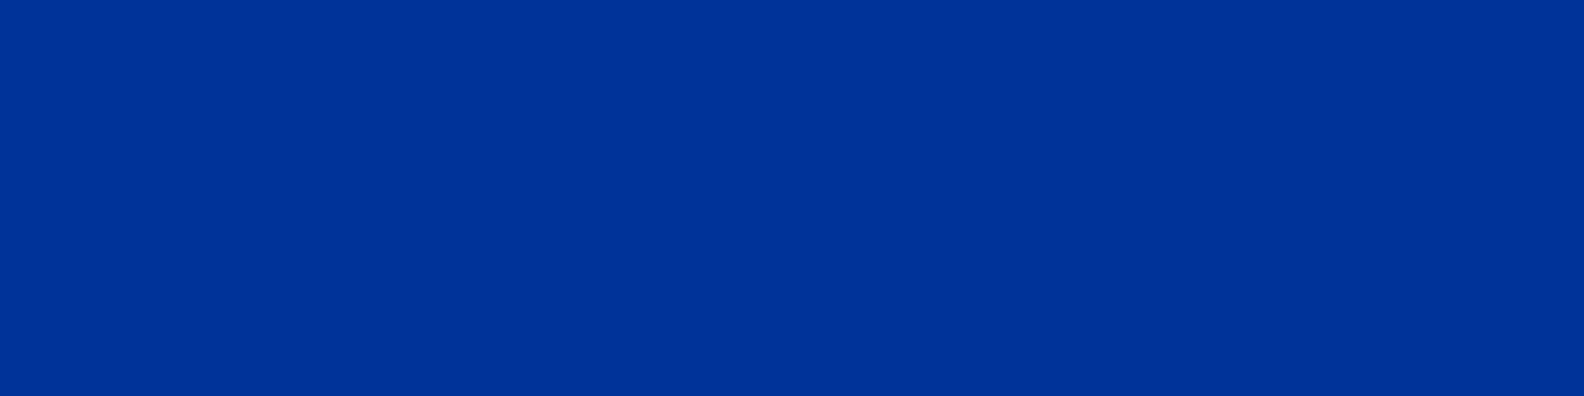 1584x396 Smalt Dark Powder Blue Solid Color Background